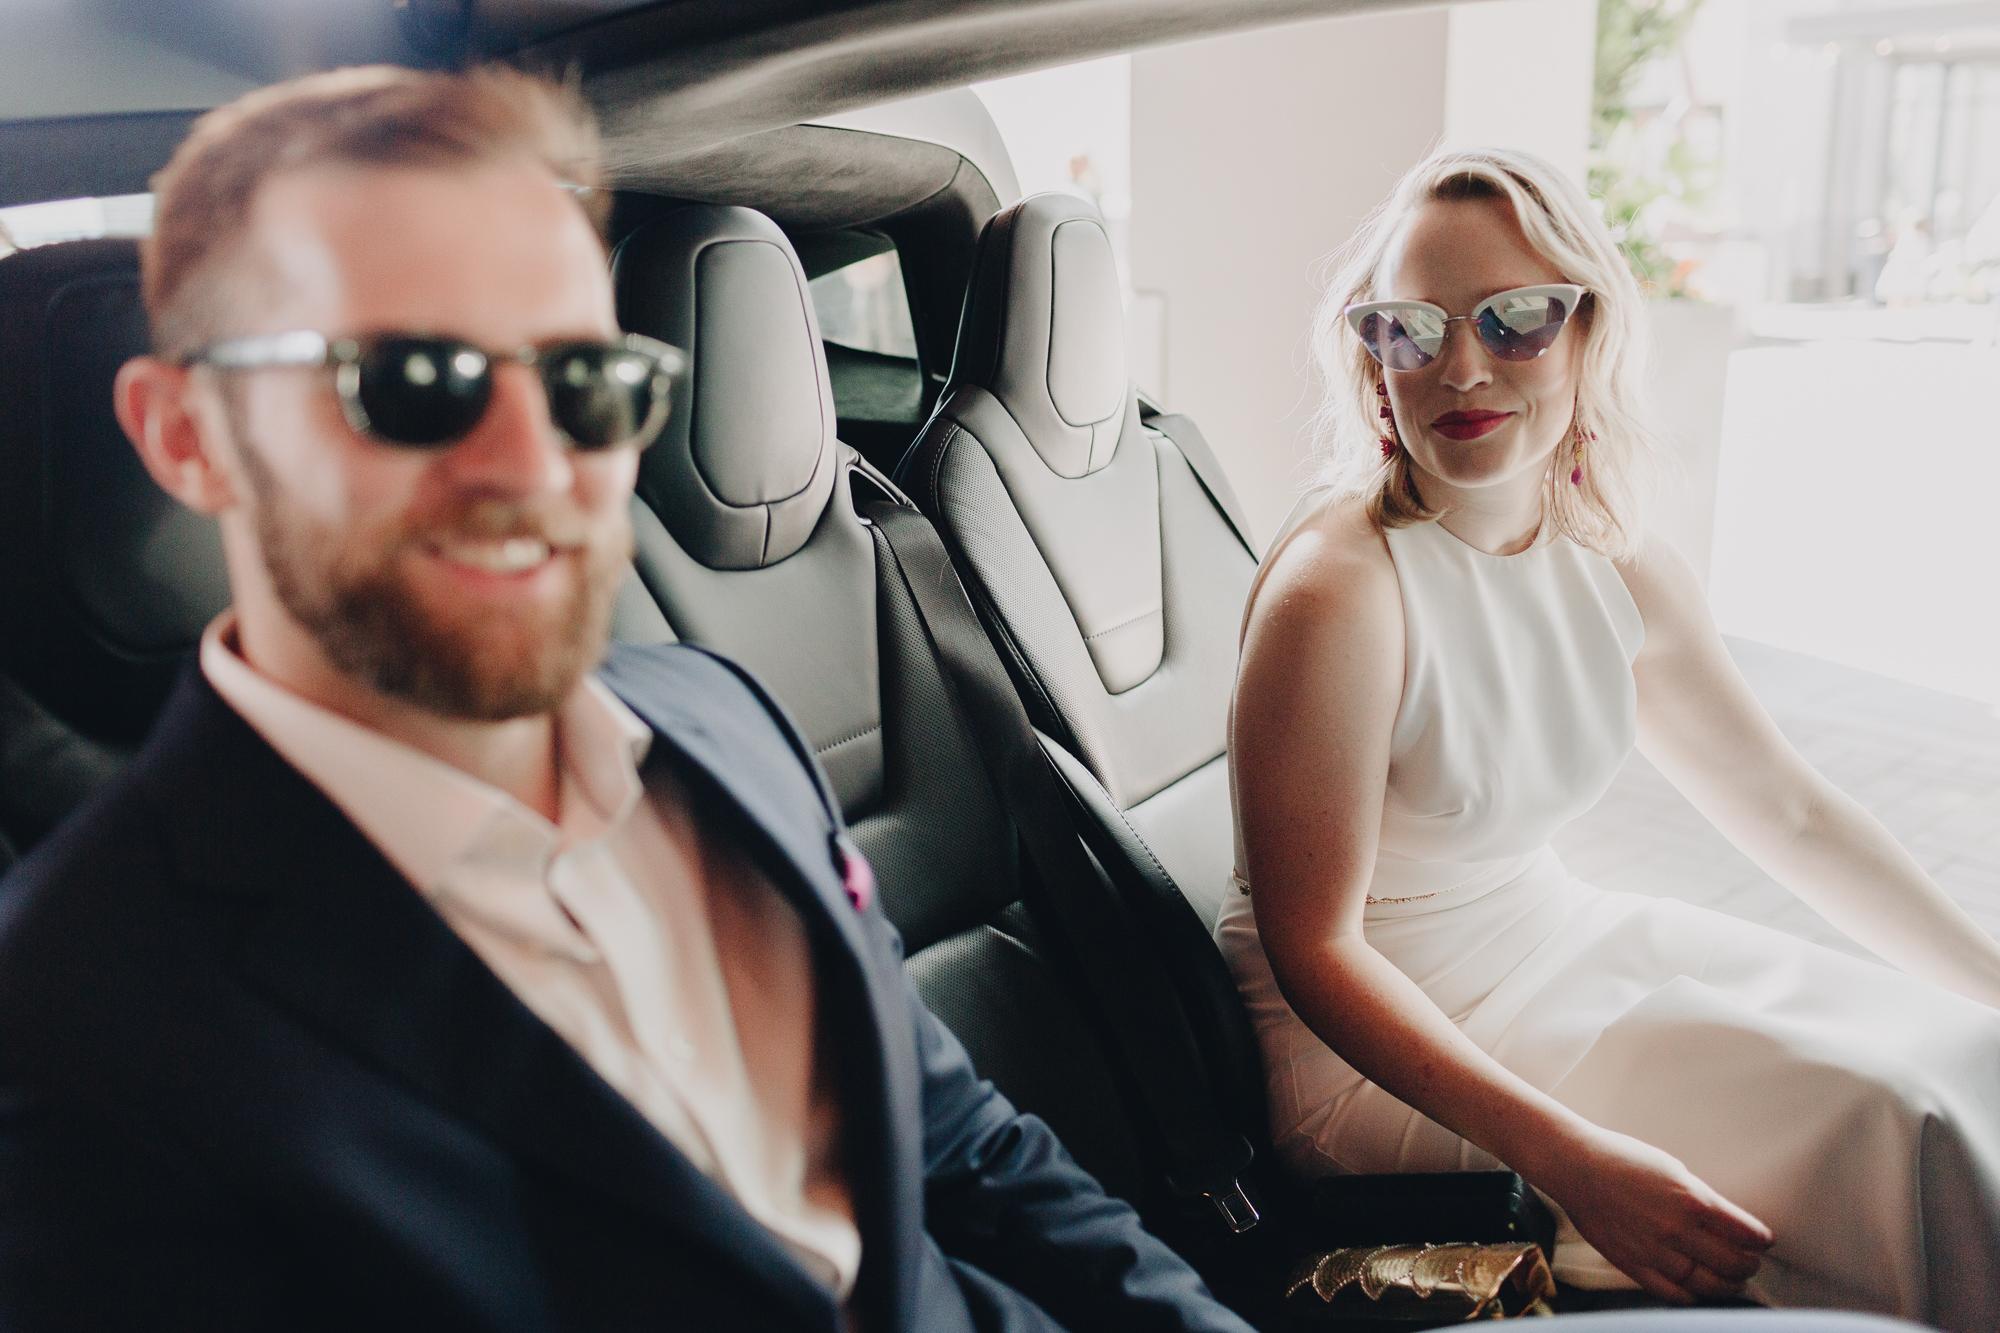 canvas event space wedding photos by Krista Welch-0023.jpg